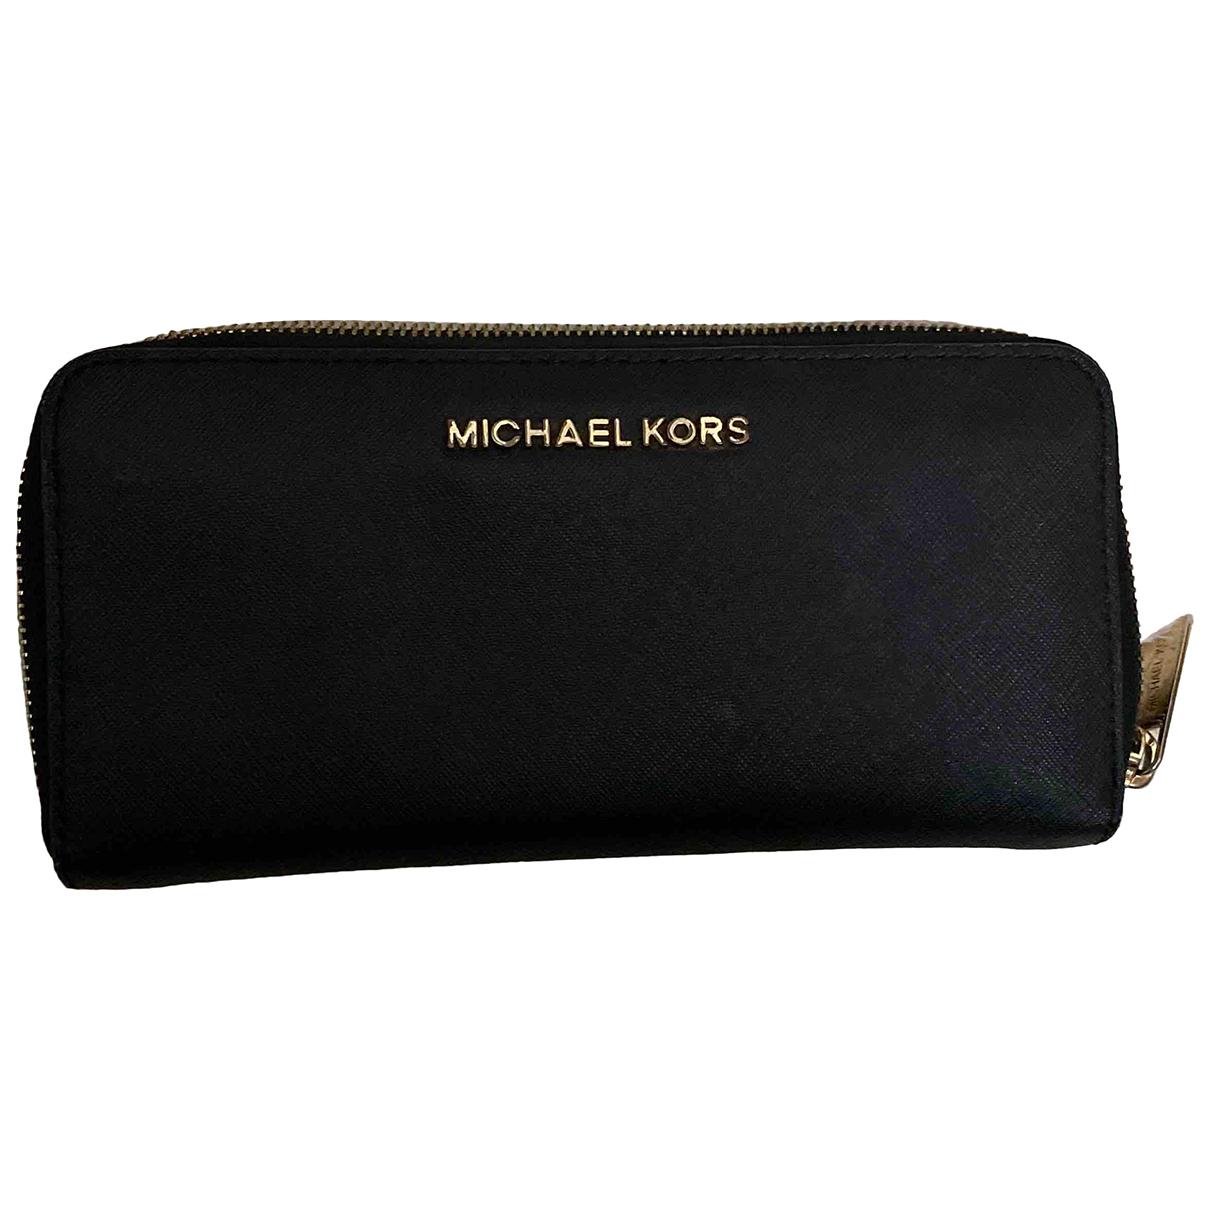 Michael Kors Jet Set Black Leather wallet for Women N